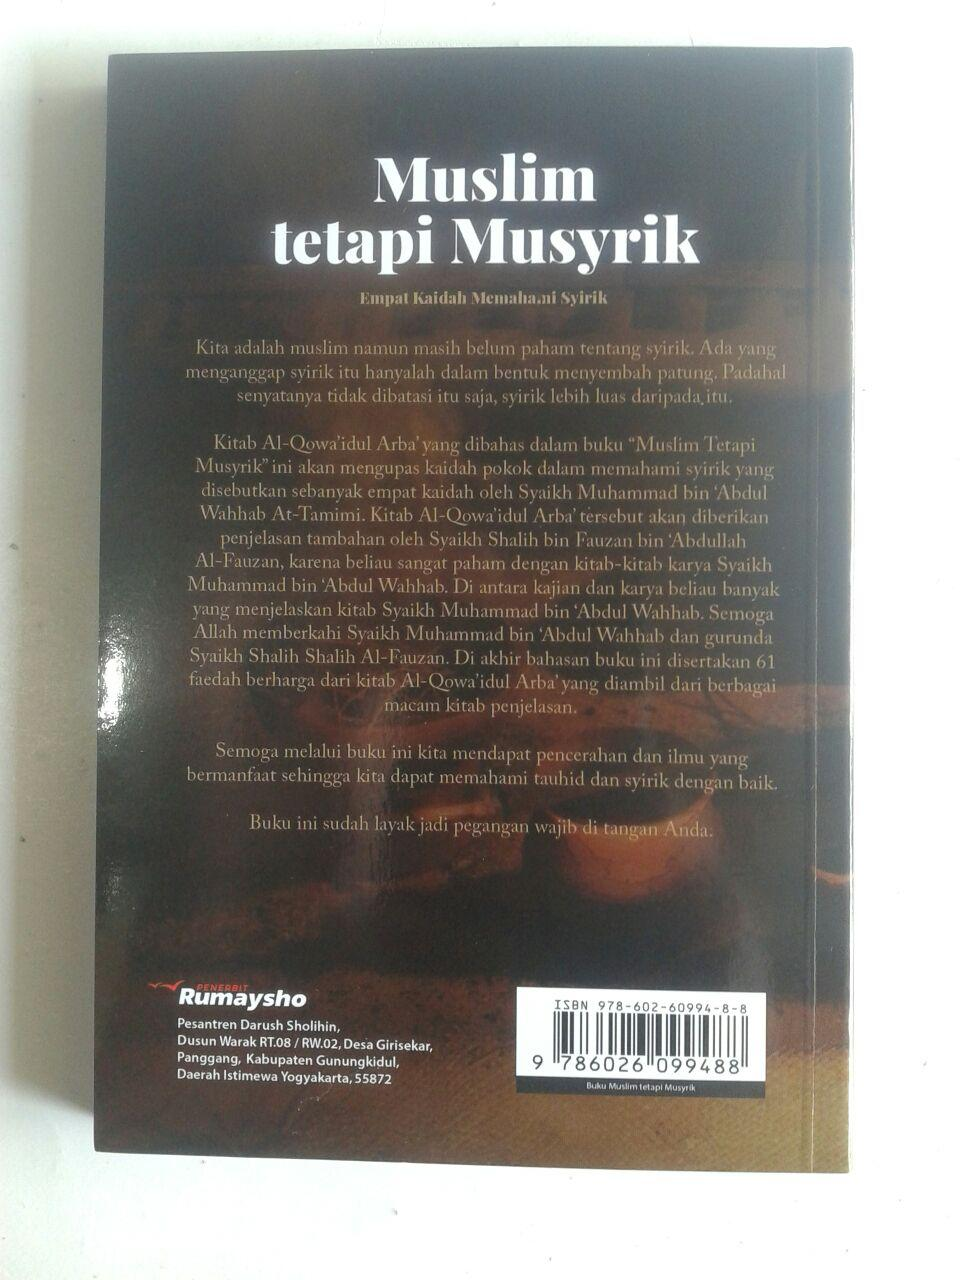 Buku Muslim Tetapi Musyrik Empat Kaidah Memahami Syirik cover